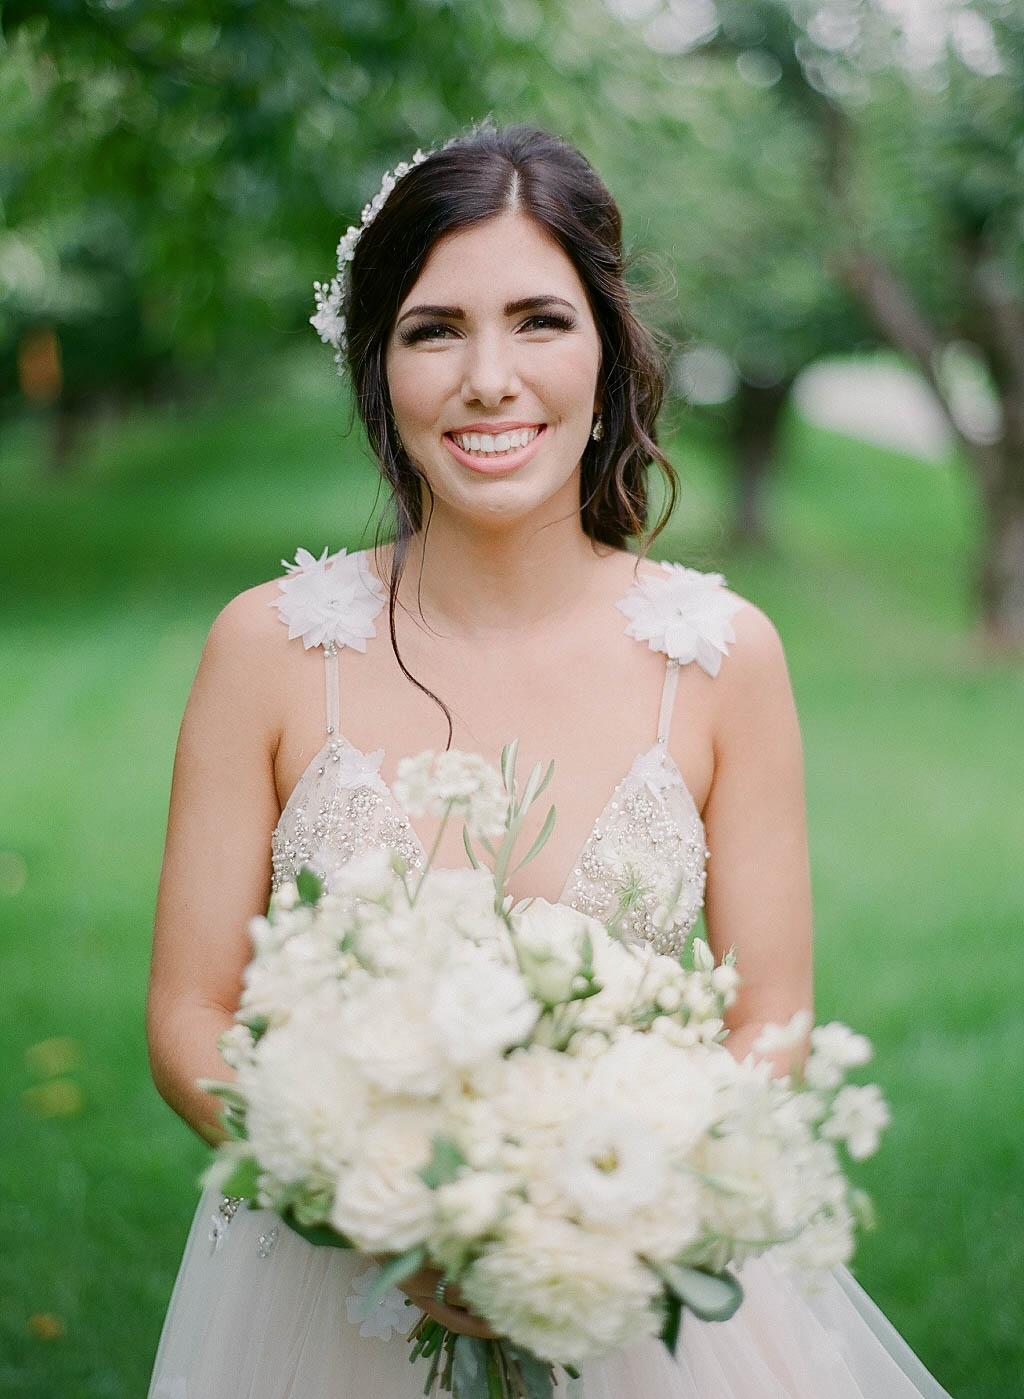 bride smile white bouquet.jpg